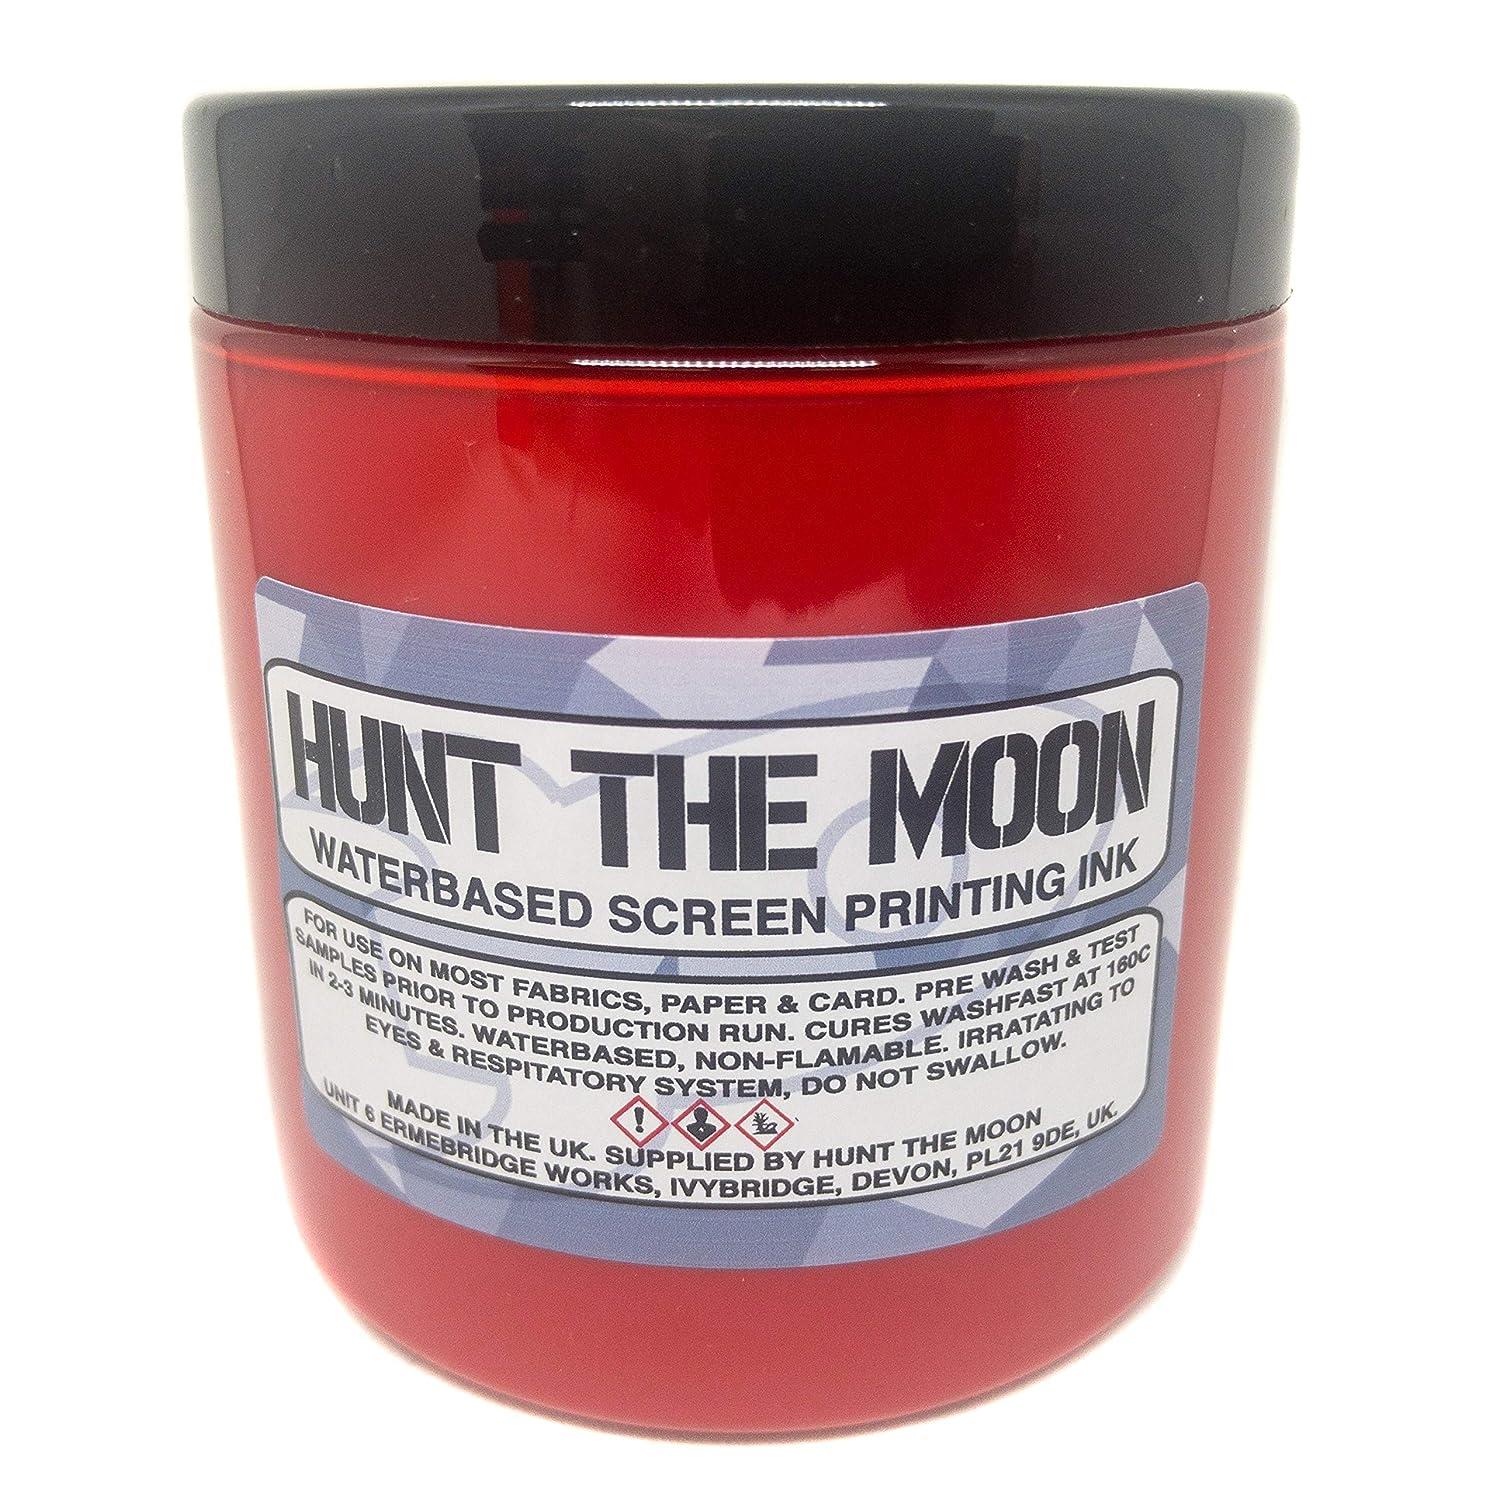 Hunt The Moon Water Based Screen Printing Ink, Rocket Red, 240ml